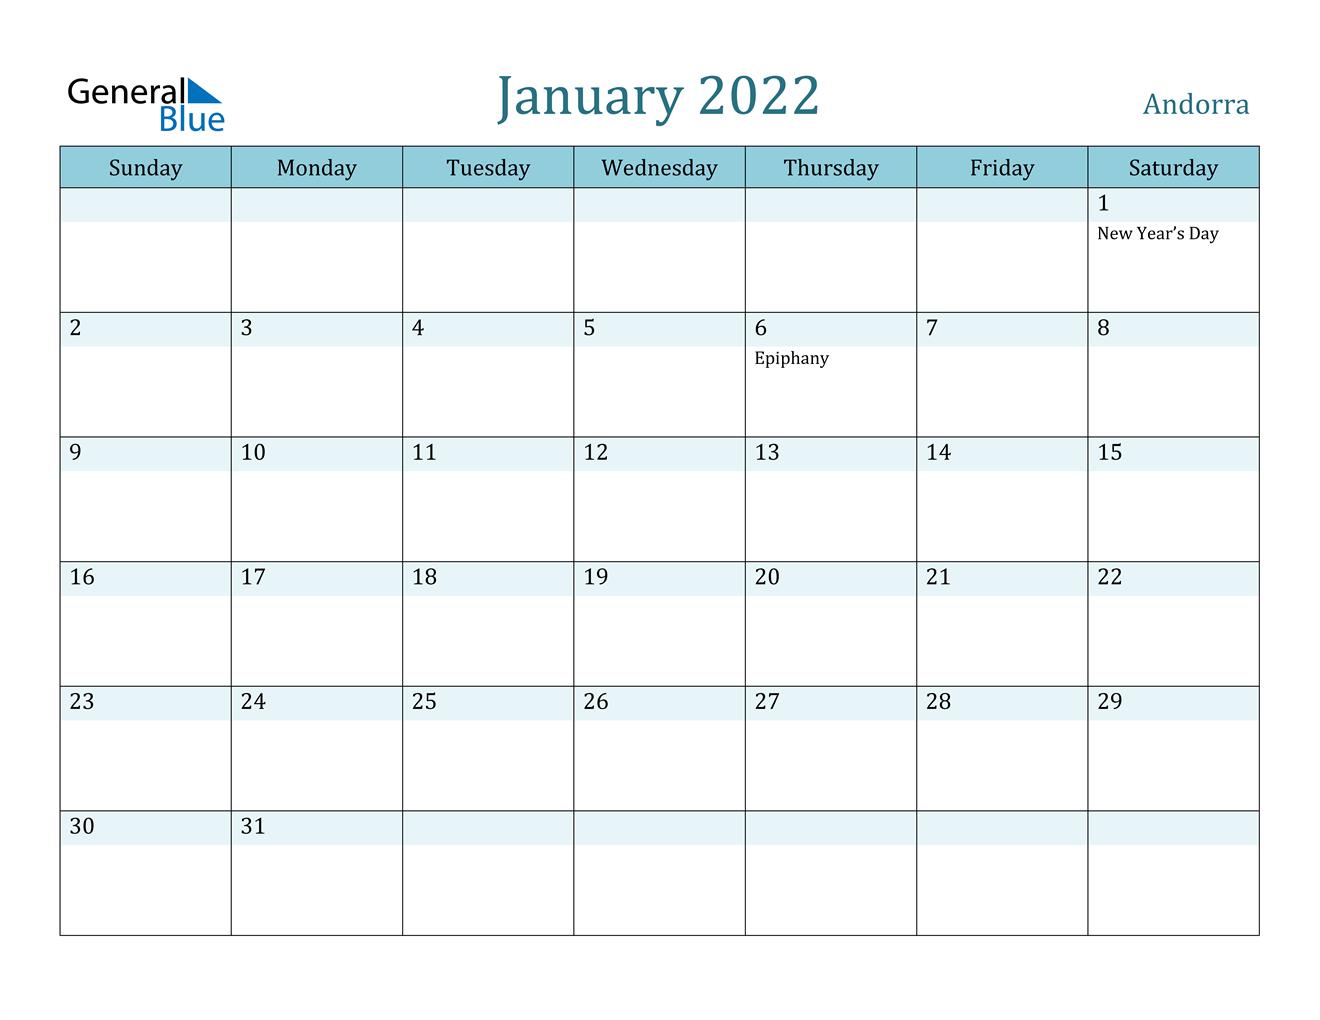 Andorra January 2022 Calendar With Holidays With Printable Calendar October 2022 To January 2022